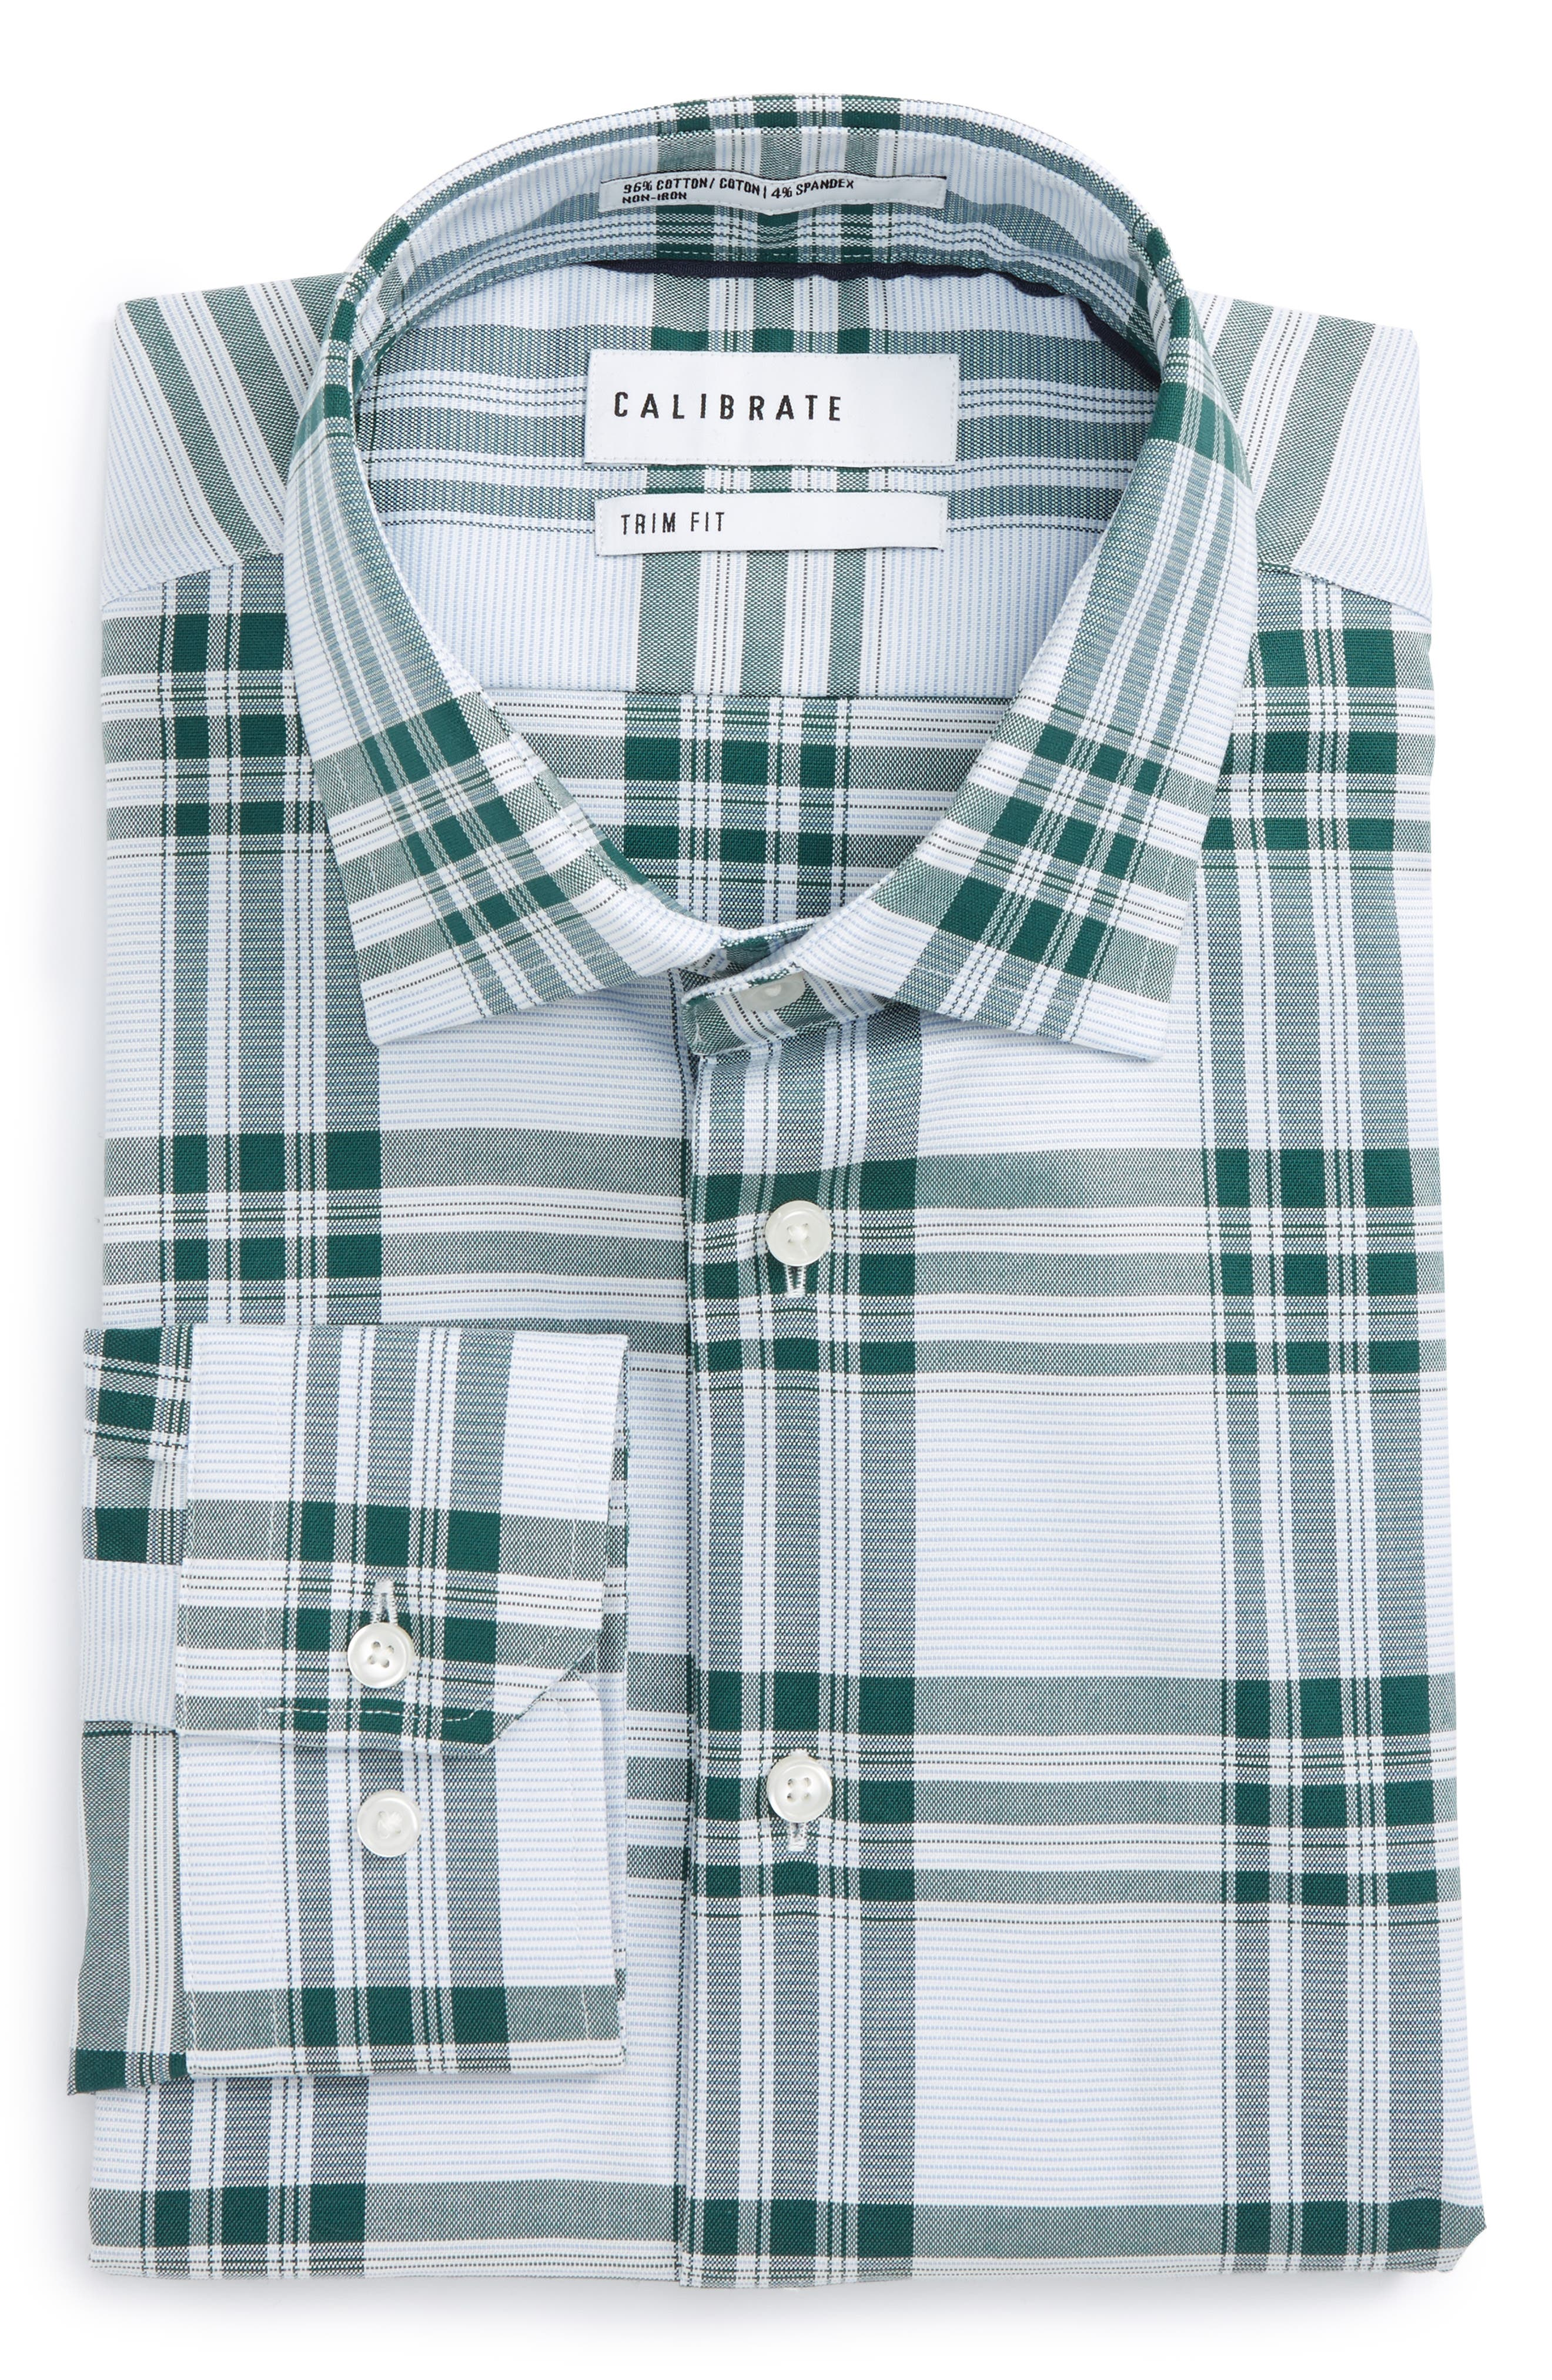 Main Image - Calibrate Trim Fit Plaid Non-Iron Stretch Dress Shirt